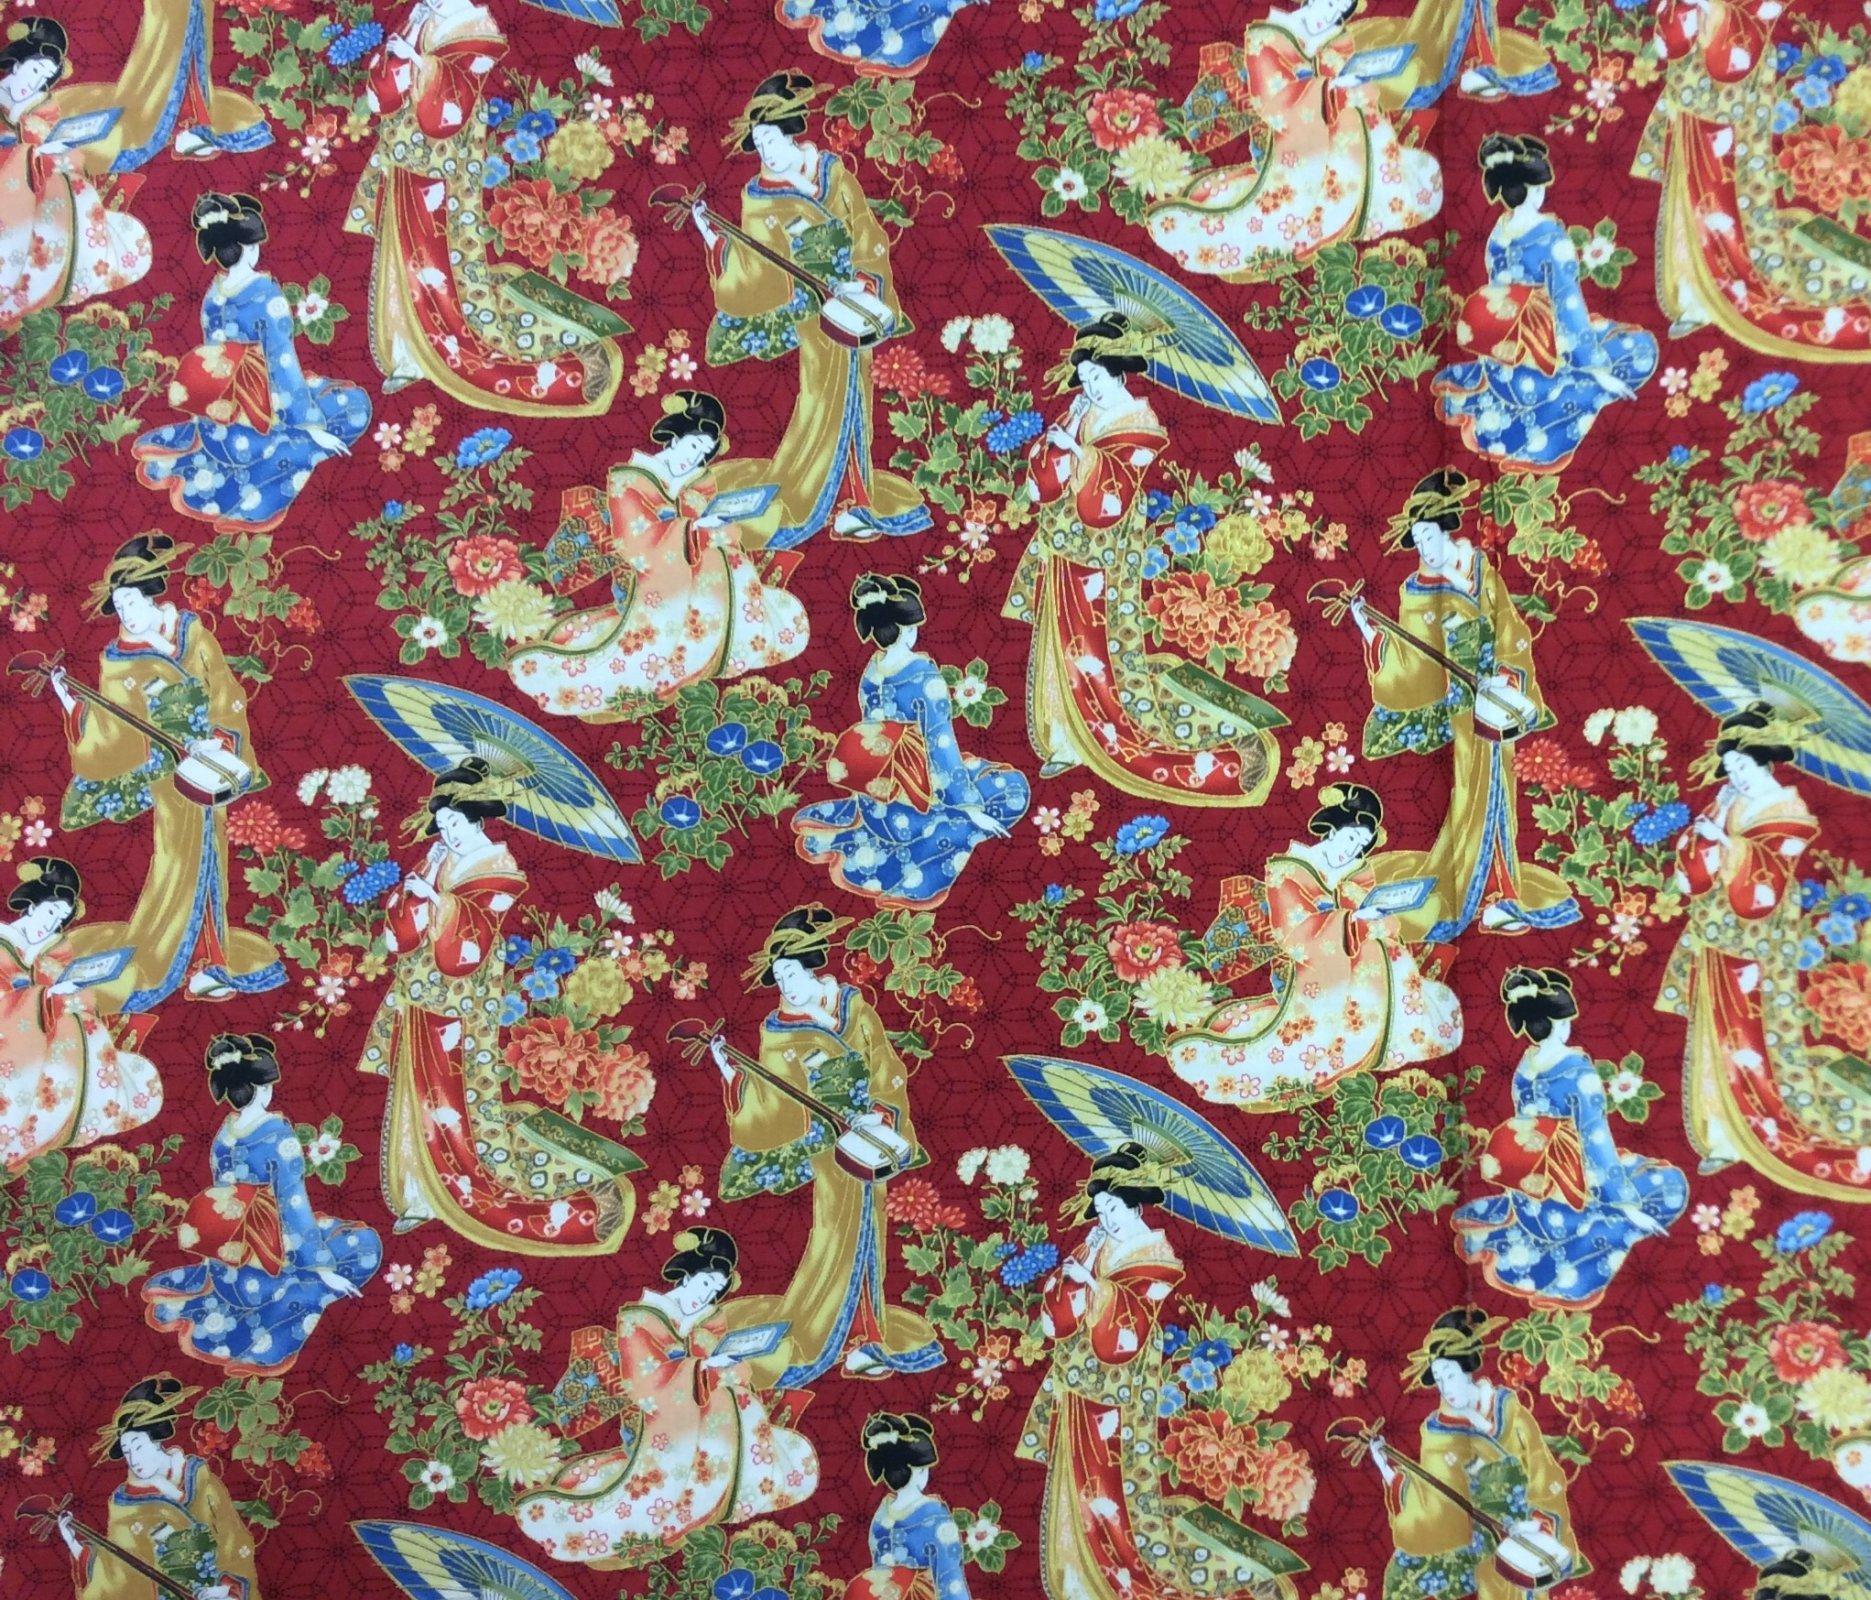 FAT QUARTER! Japanese Geisha Garden Kimono Fan Asia Japan Cotton Fabric Quilting Fabric RPFNC27